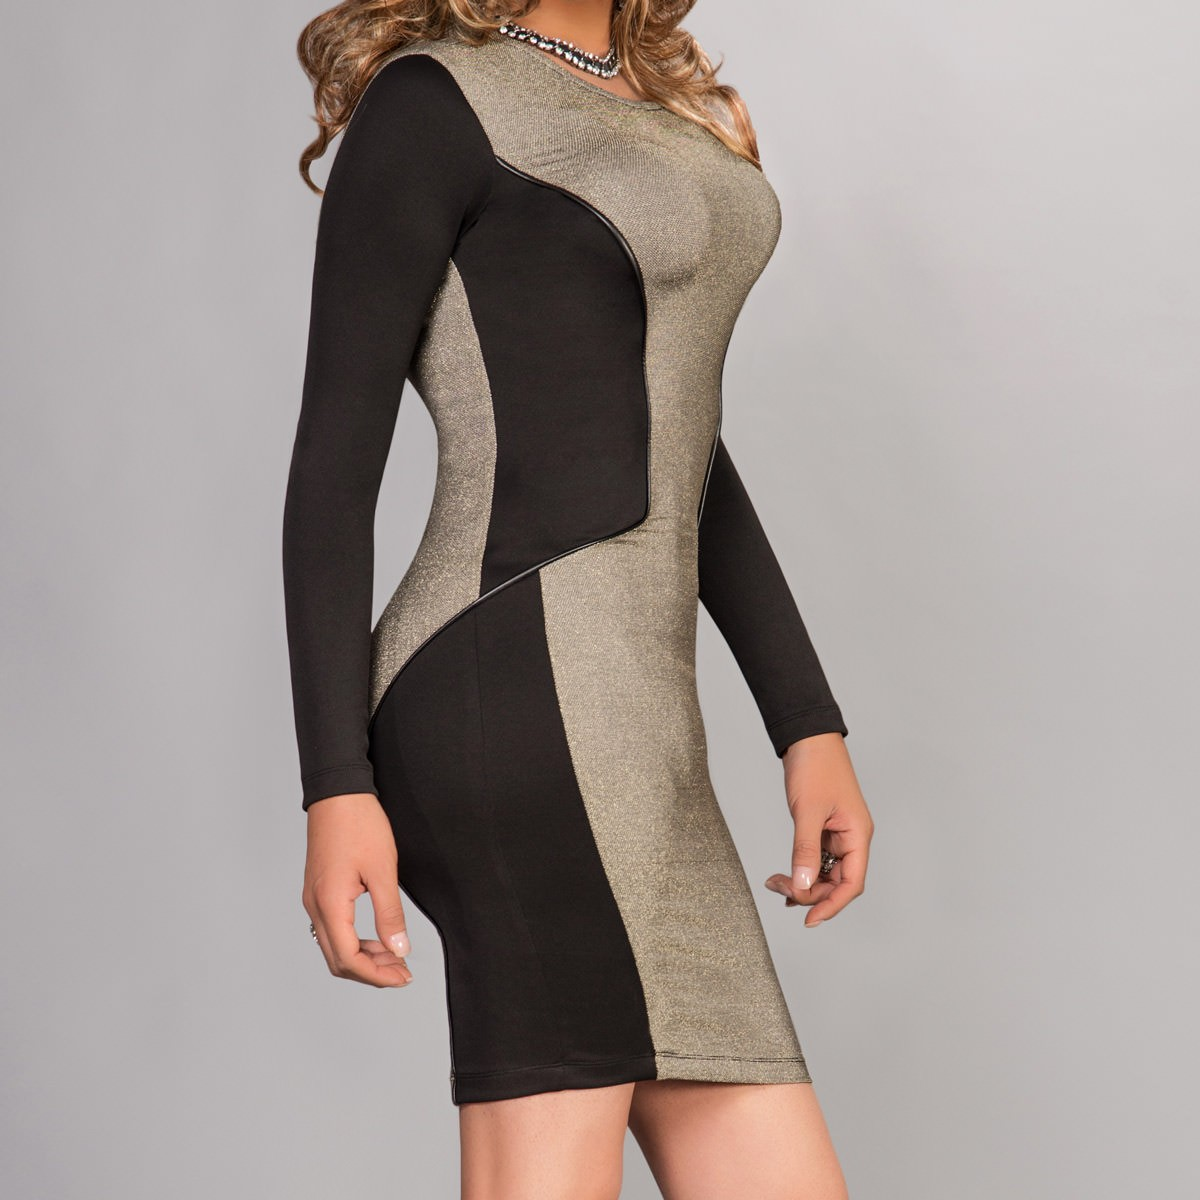 Cdbfstore Crossdressers Supreme Bodycon Hourglass Dress